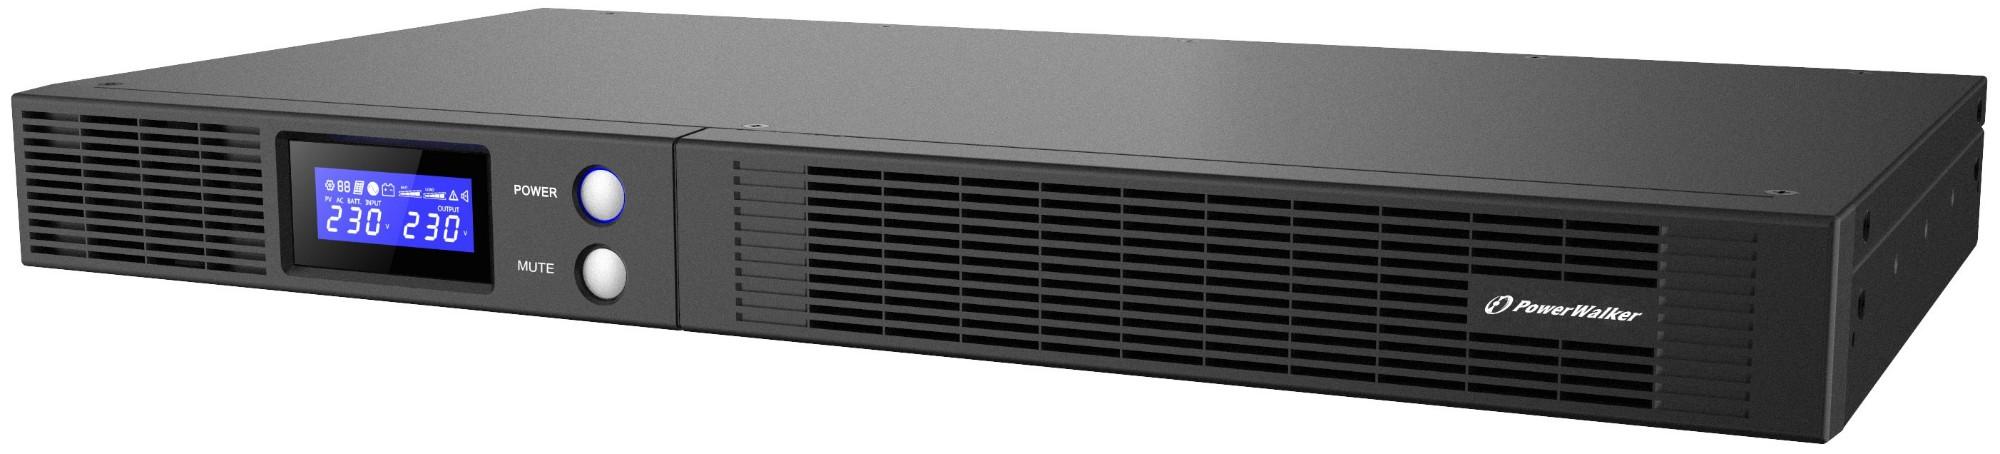 PowerWalker VI 750 R1U Line-Interactive 0.75 kVA 450 W 4 AC outlet(s)